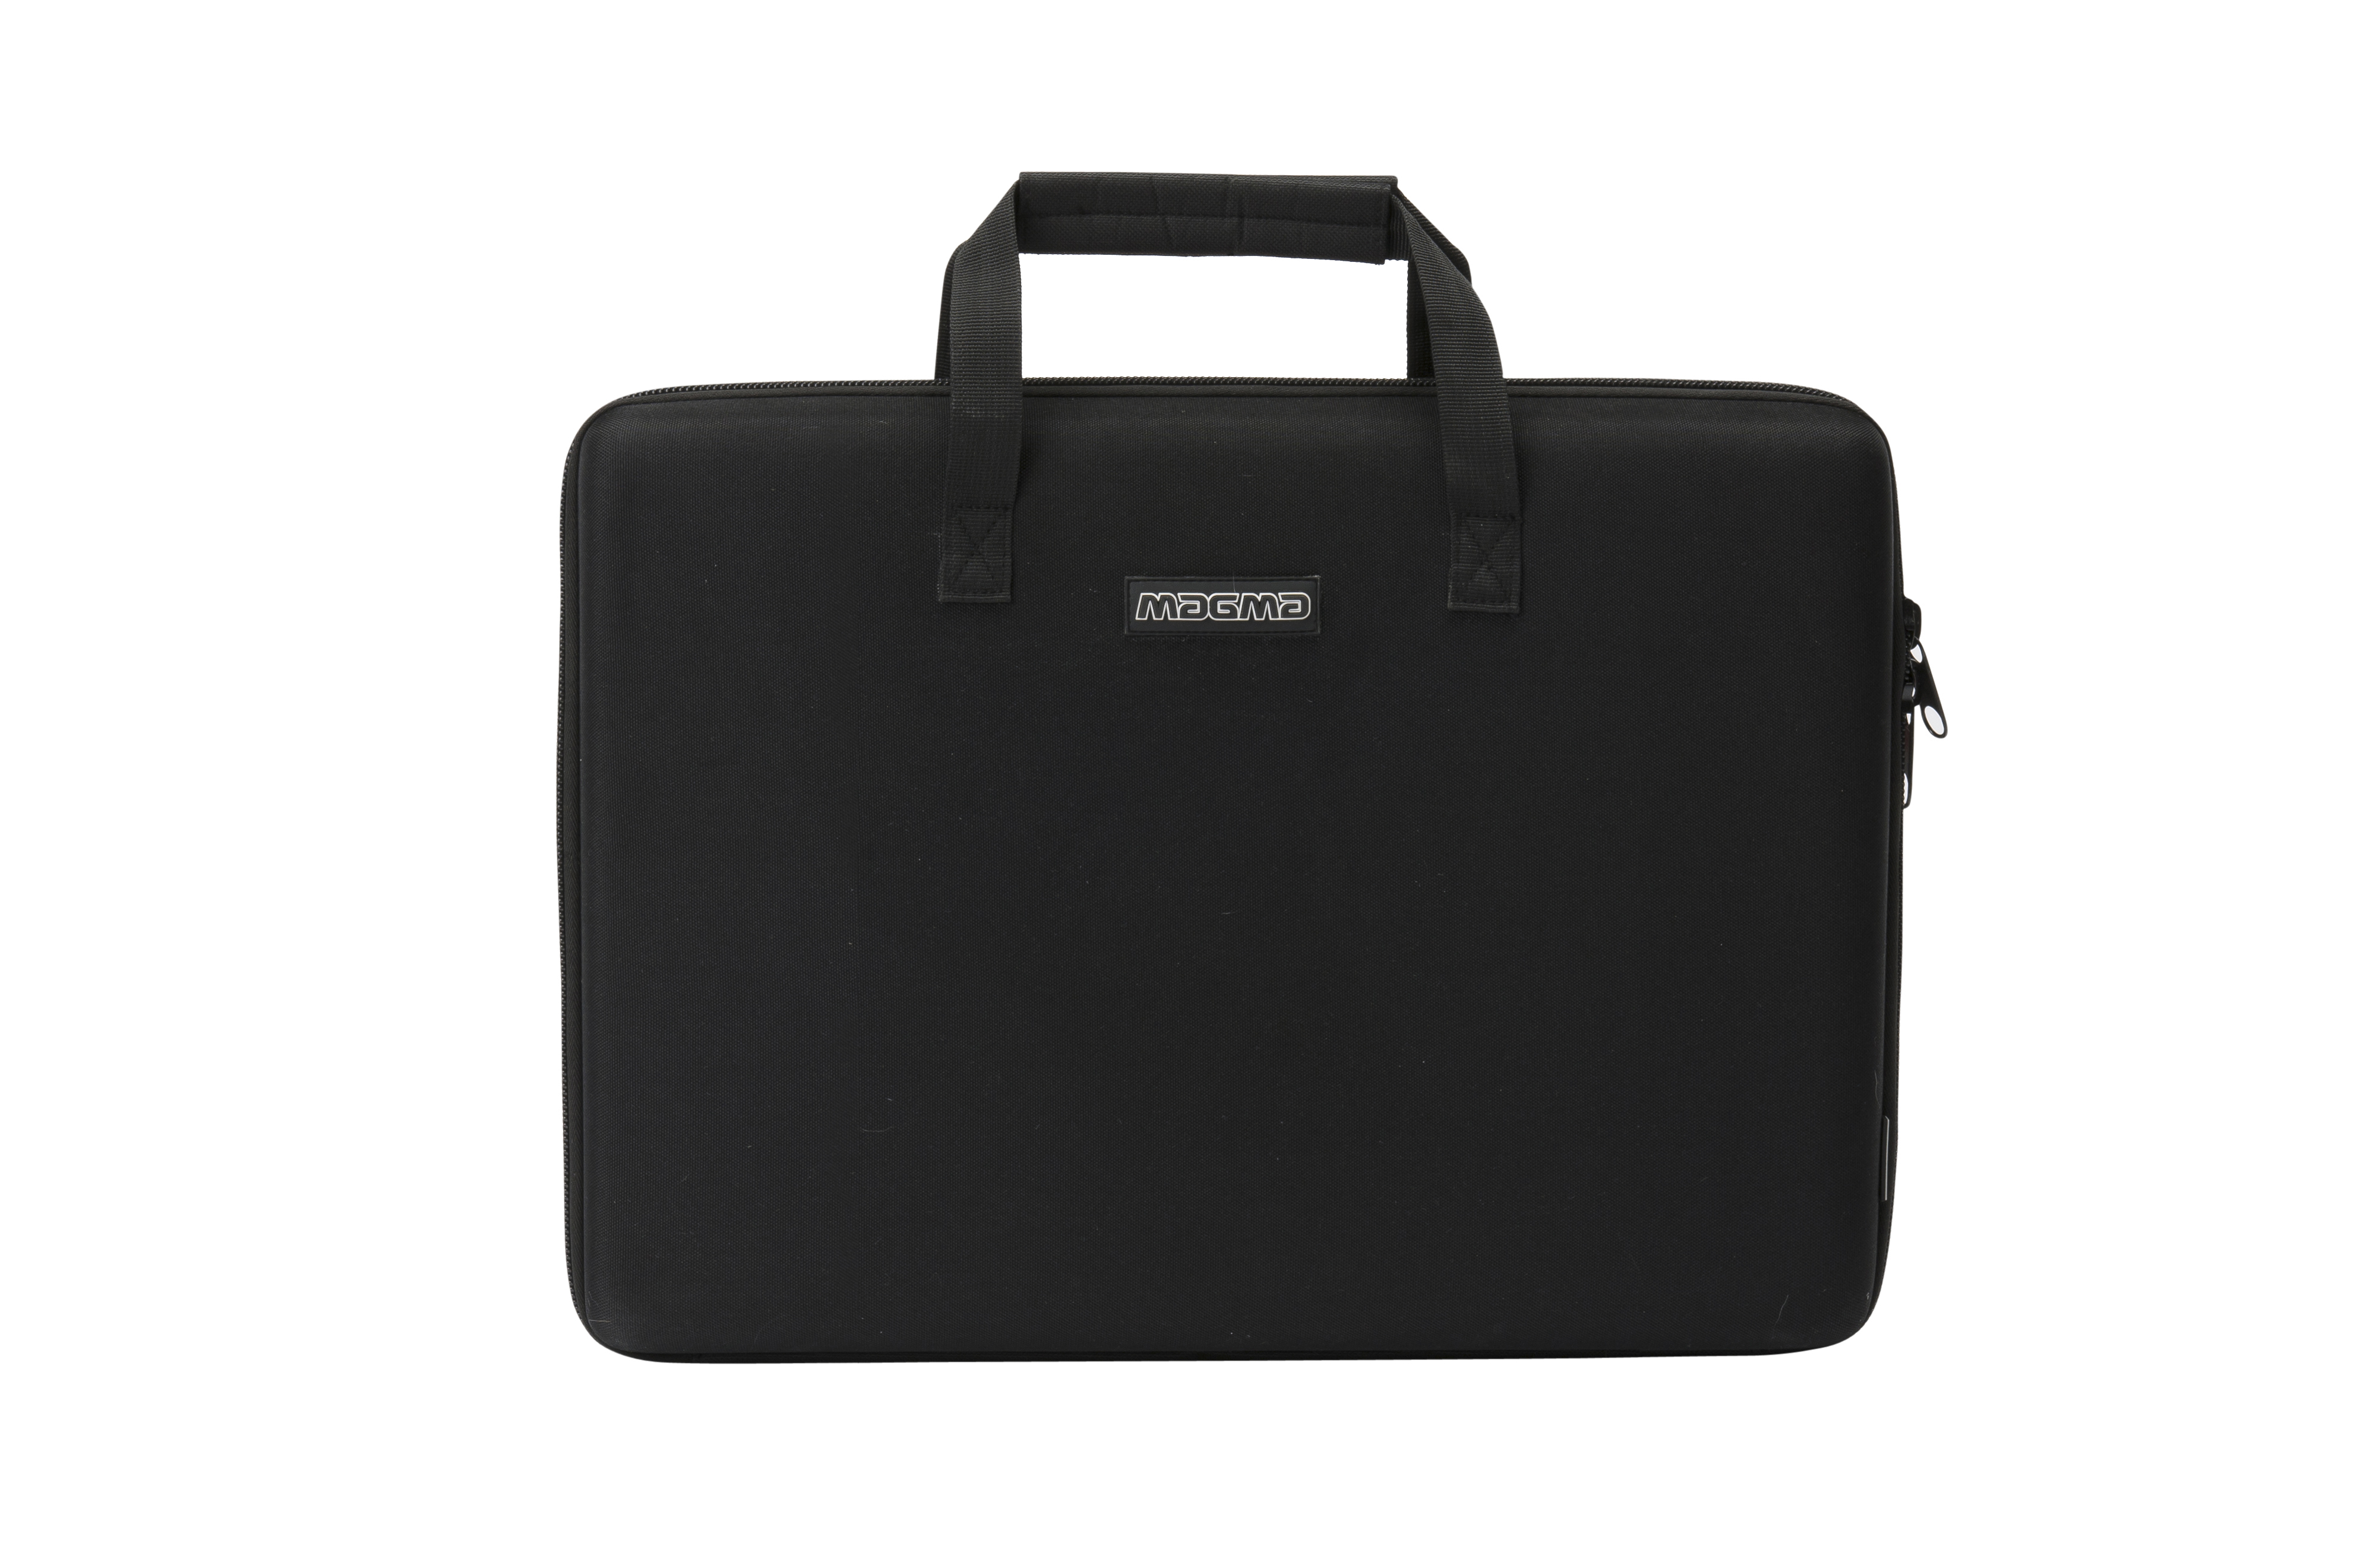 Magma-bags CTRL Case L